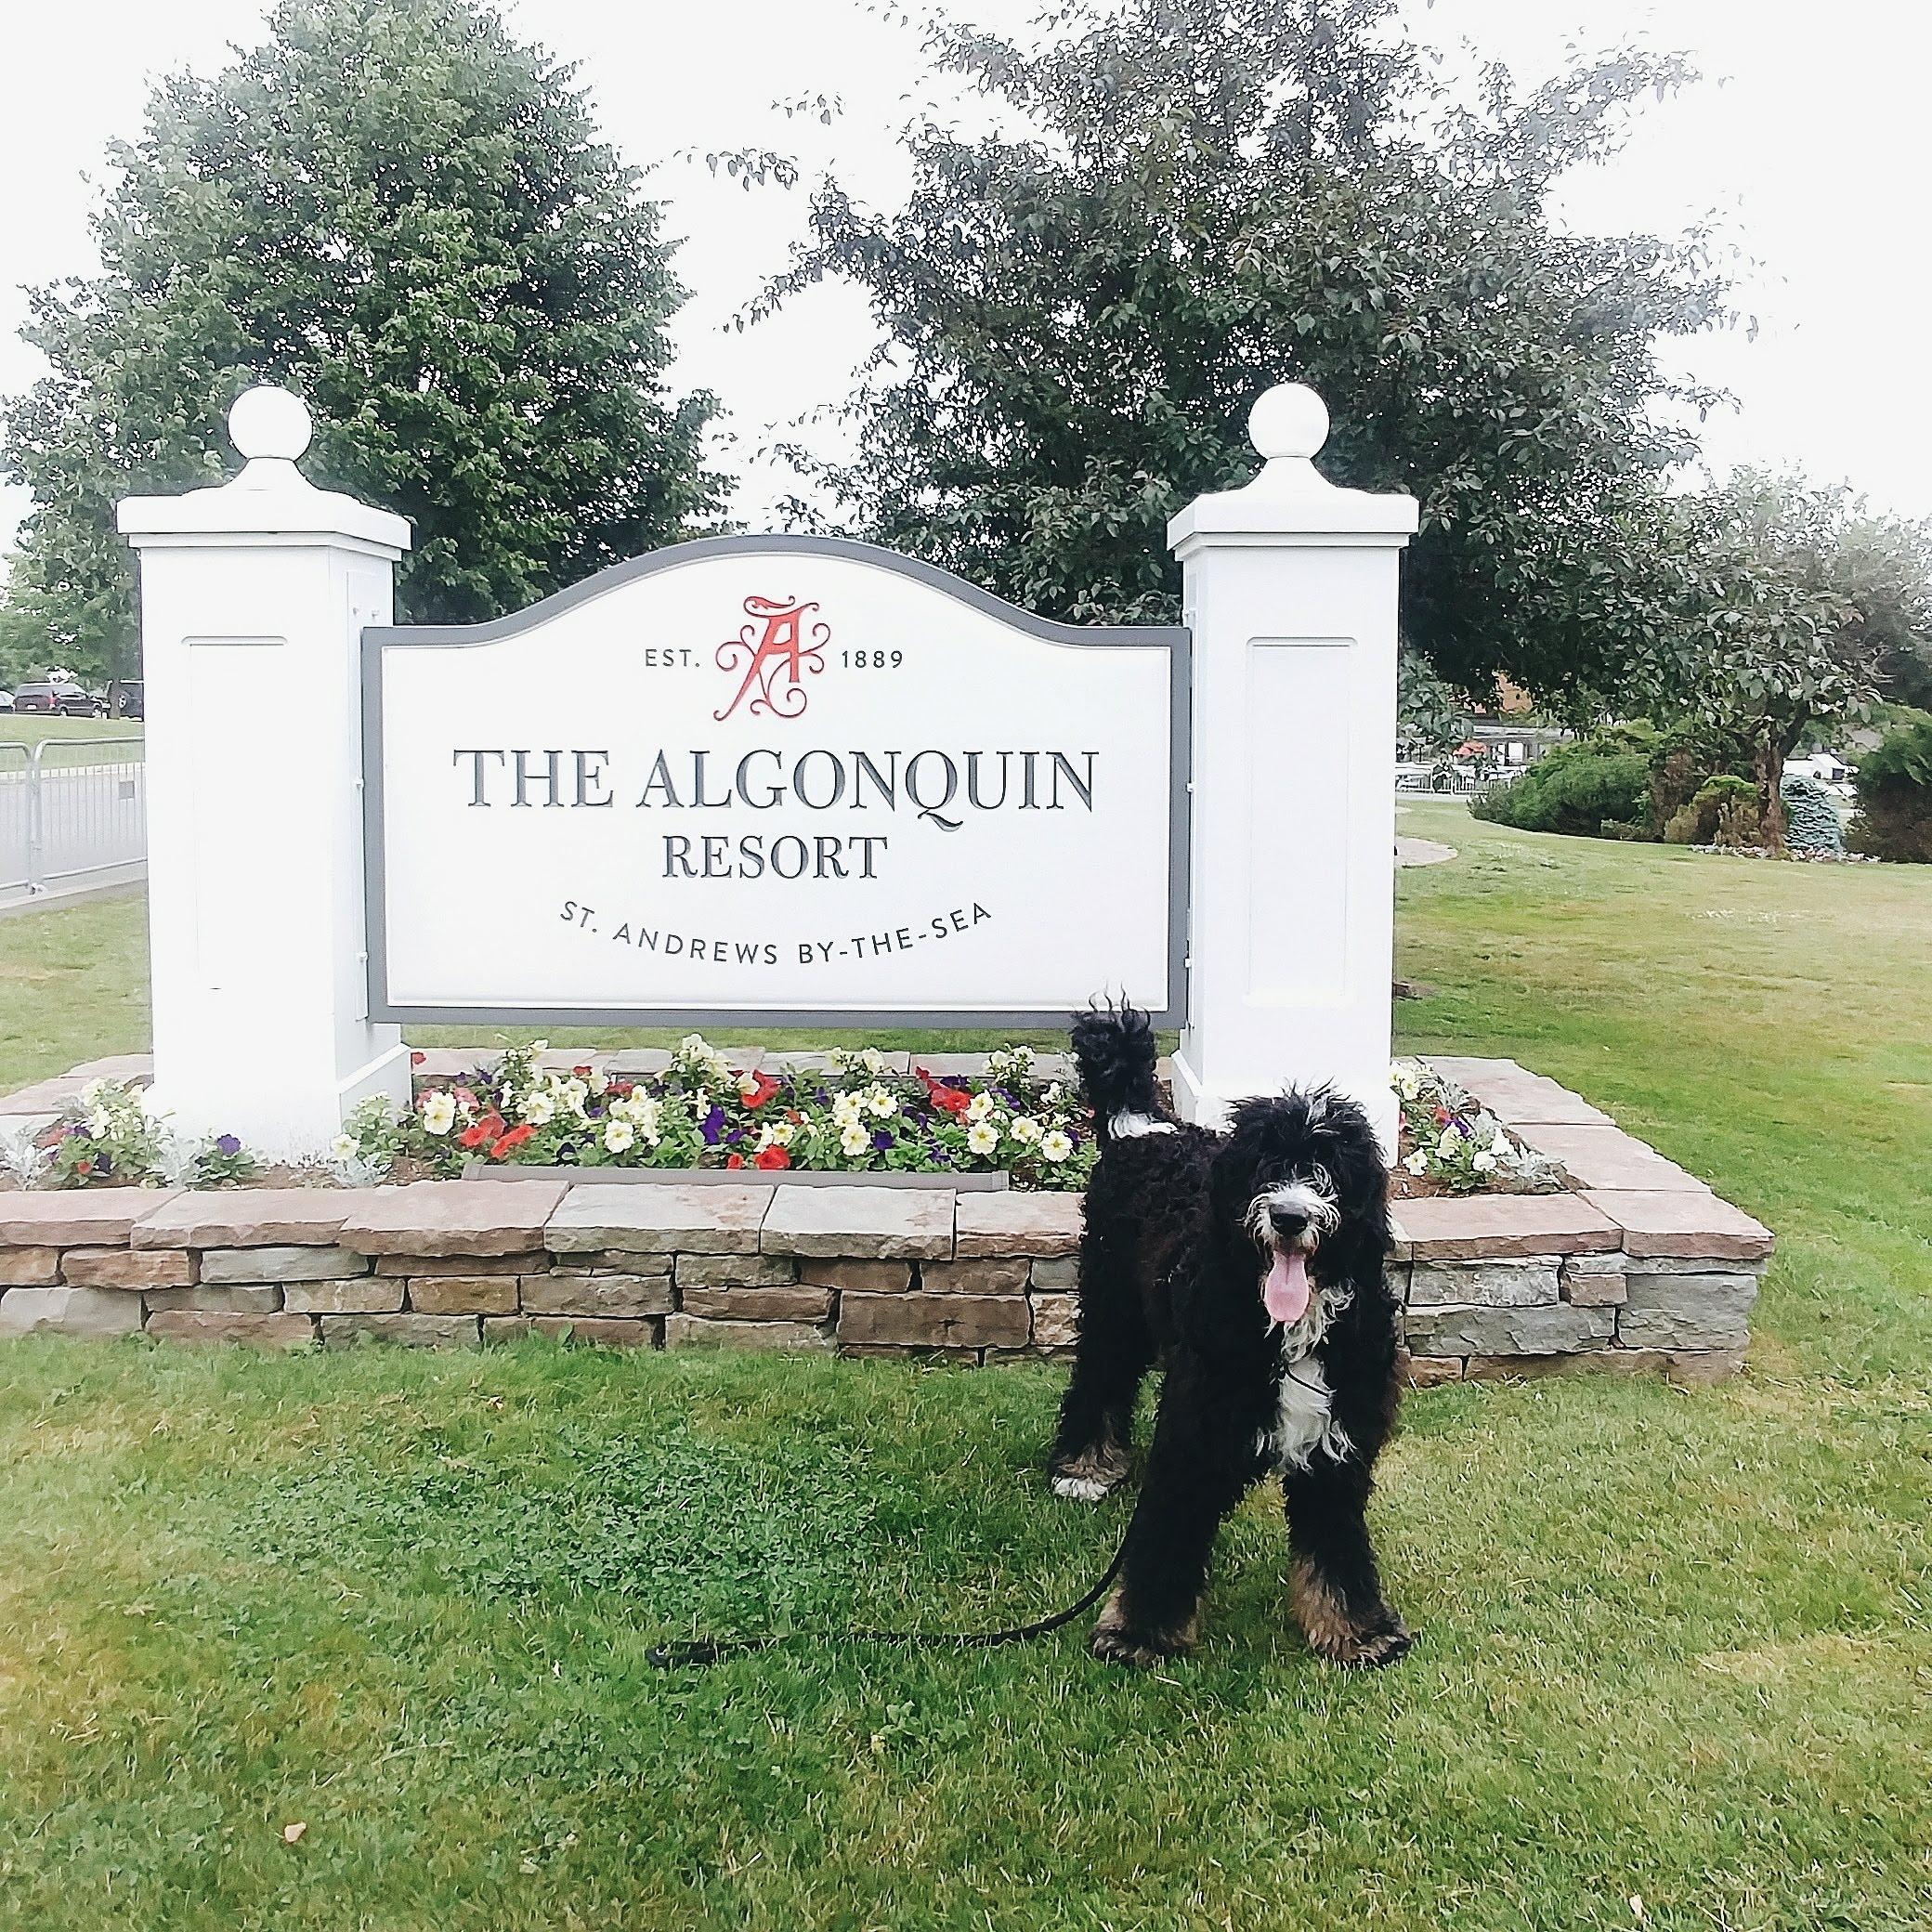 Algonquin Resort, Saint Andrews